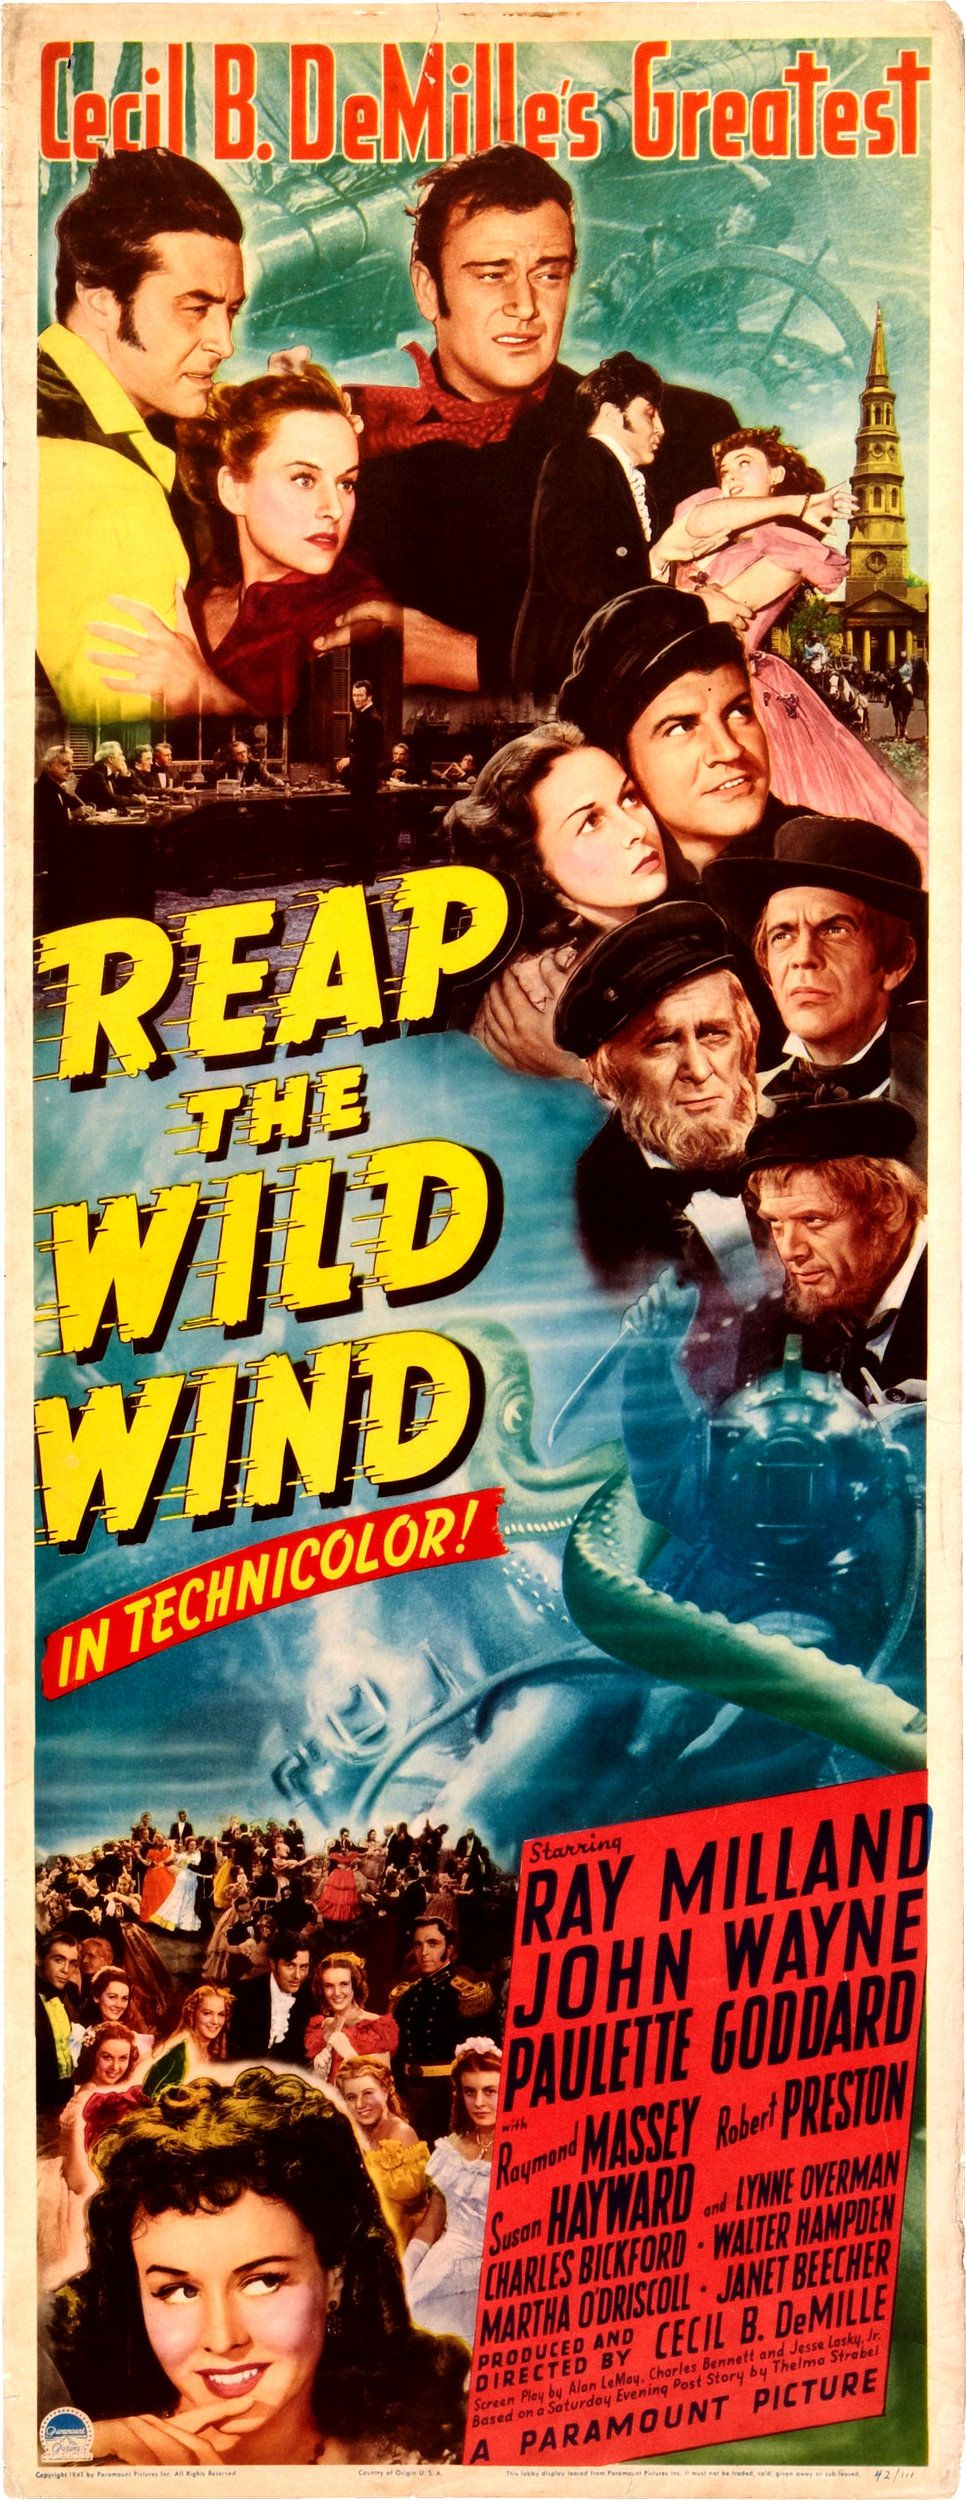 """Reap The Wild Wind (1942) John Wayne, Robert Preston, Paulette Goddard, Ray Milland, Raymond Massey"